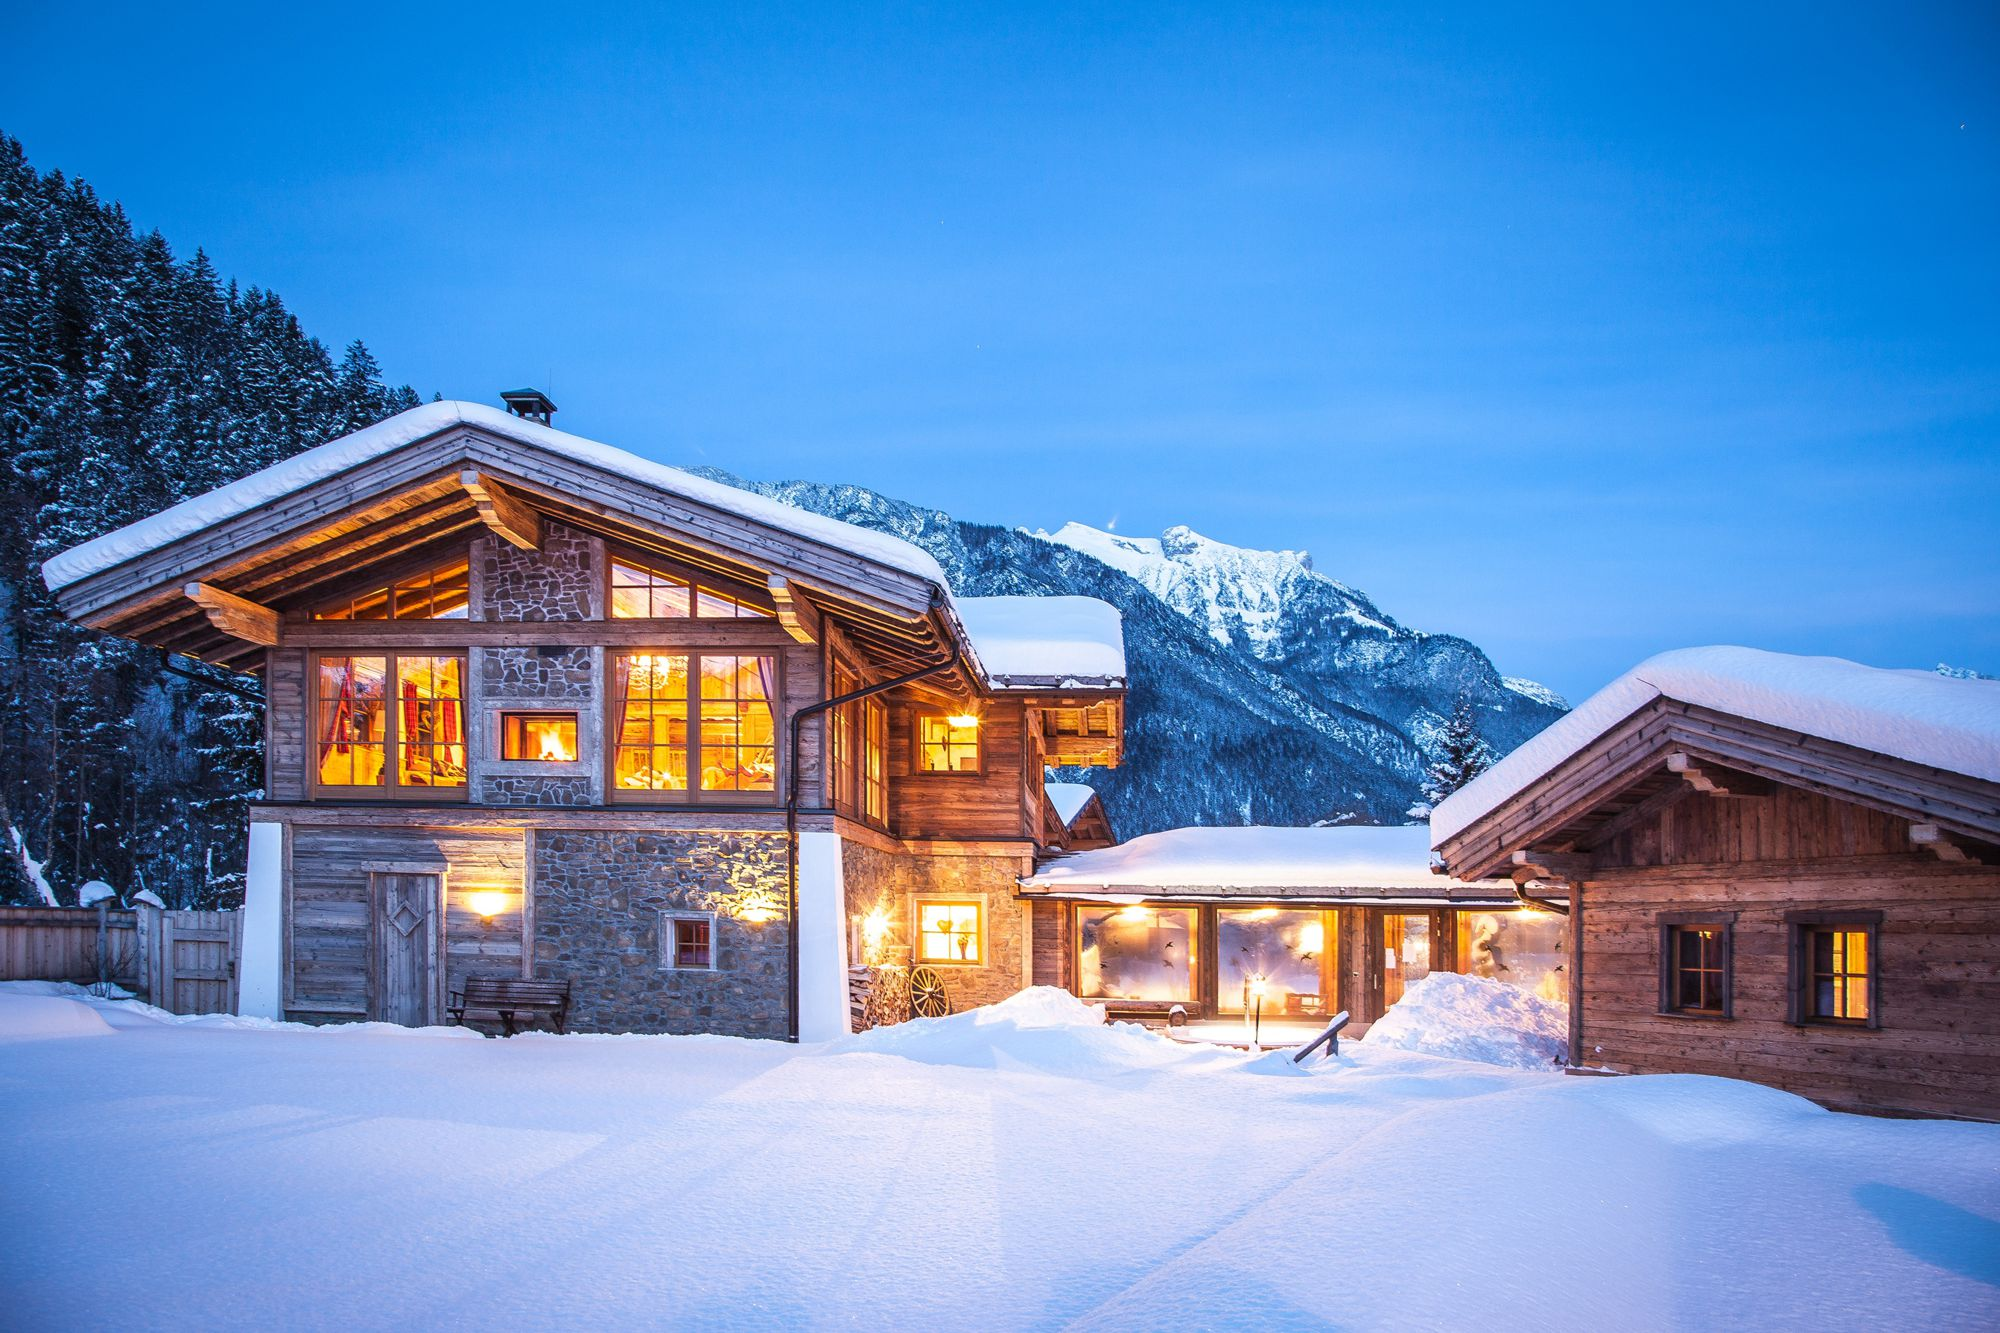 Wellnesshotel Kristall am Achensee in Tirol - wellness.at